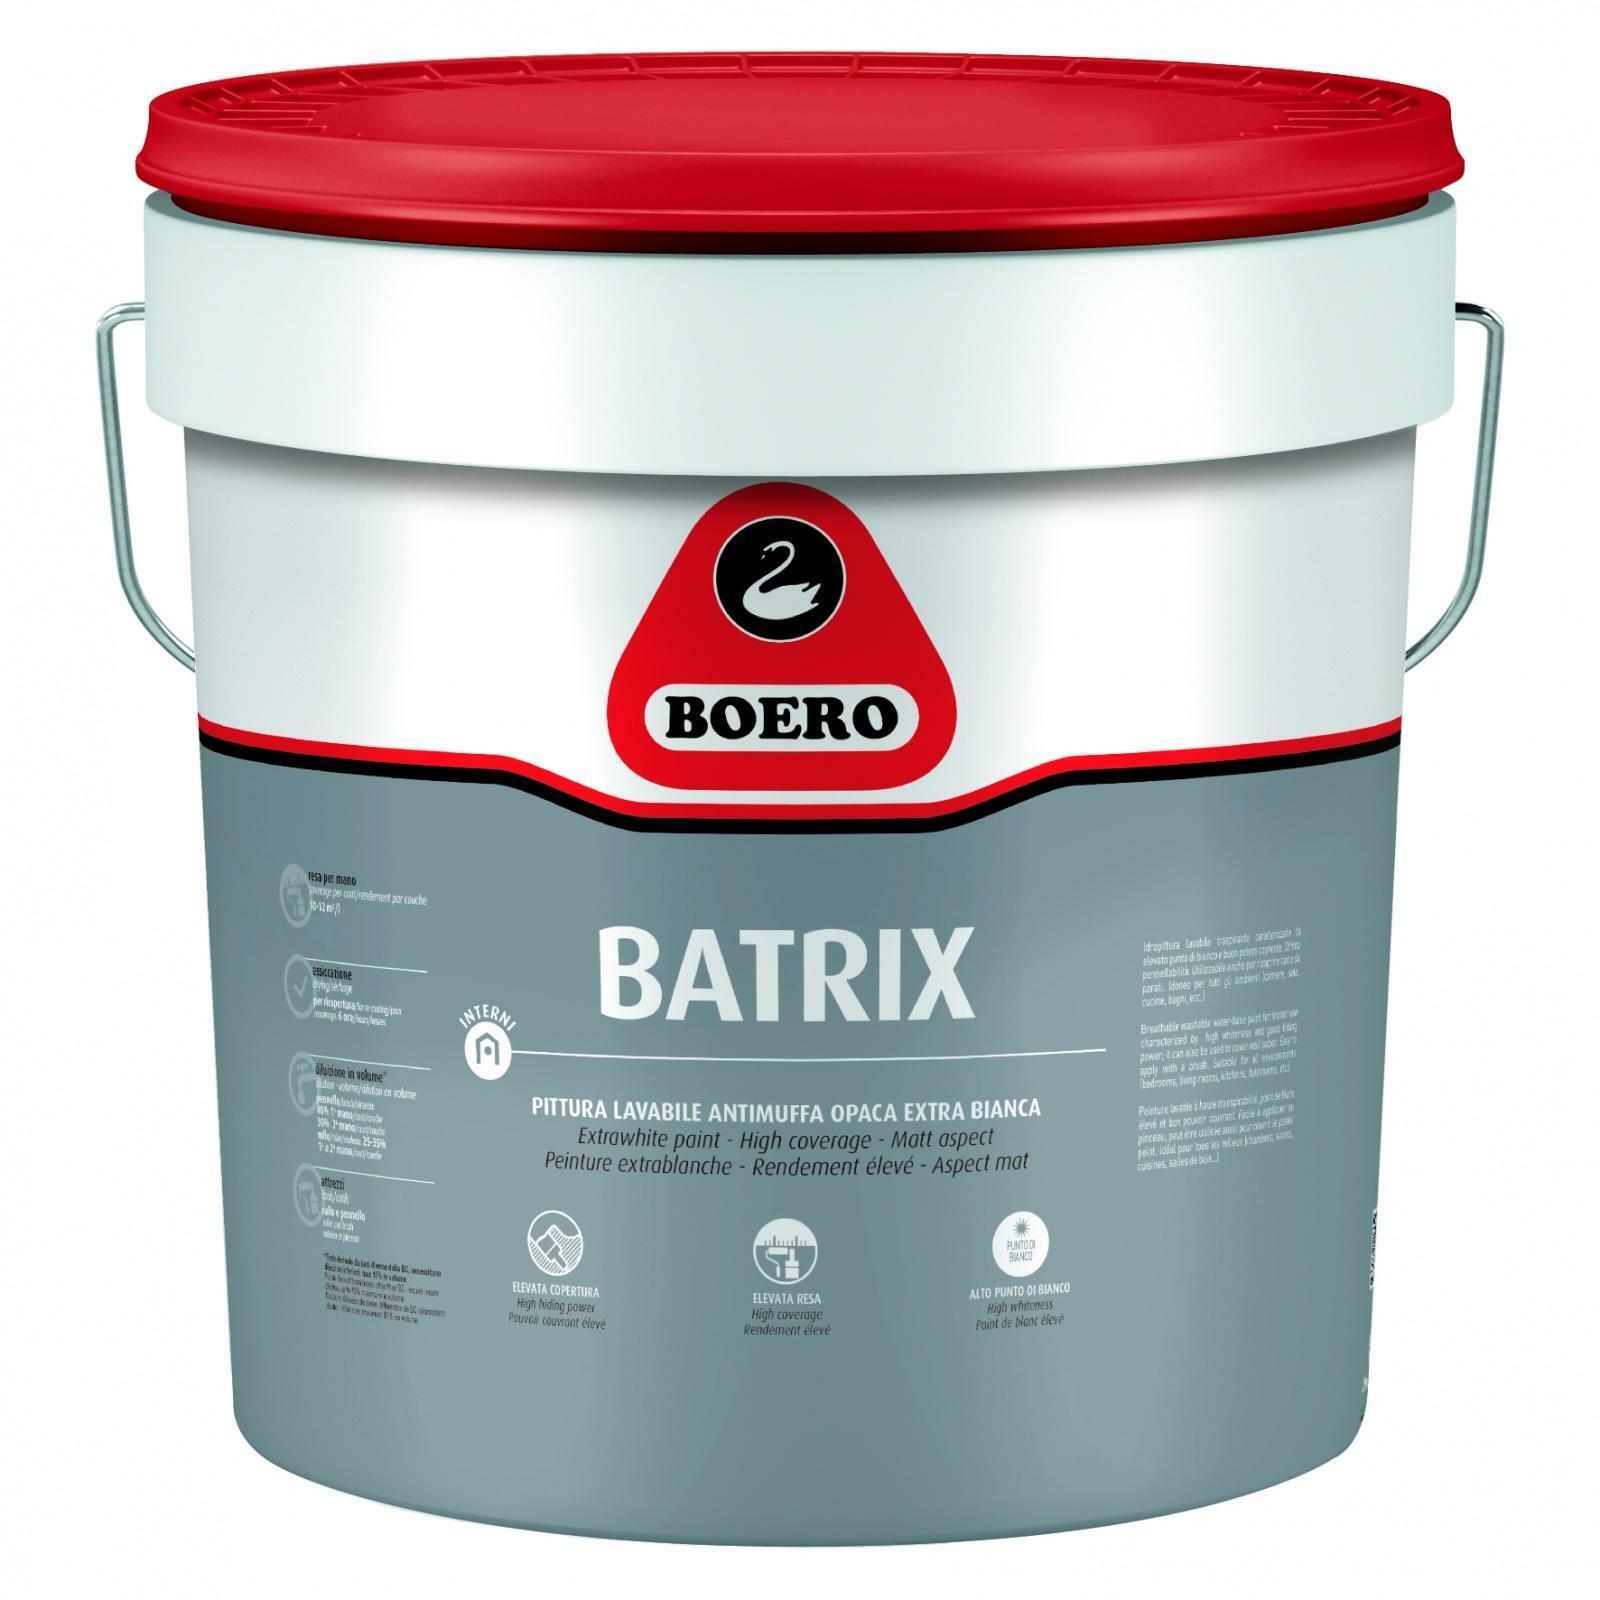 boero boero batrix pittura lavabile antimuffa 13 lt 345001